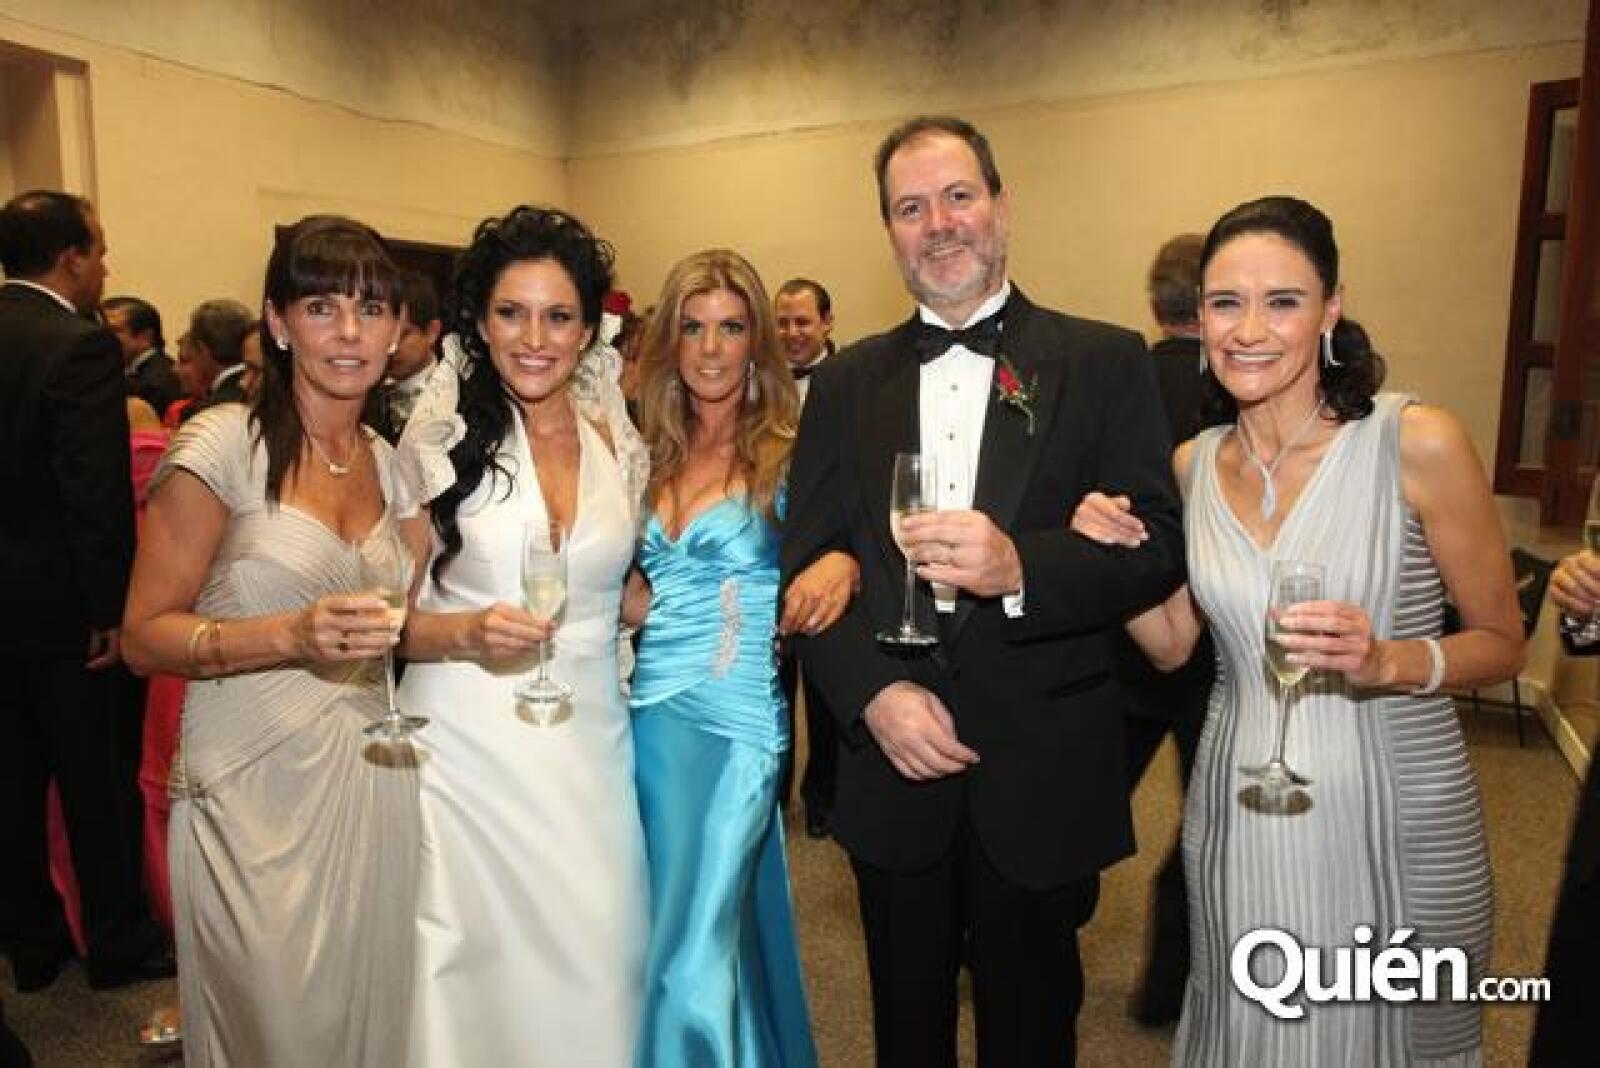 Jacky Dithurbide,Danielle Dithurbide,Denisse Salazar,Dominique Dithurbide,Maria Guadalupe Vega